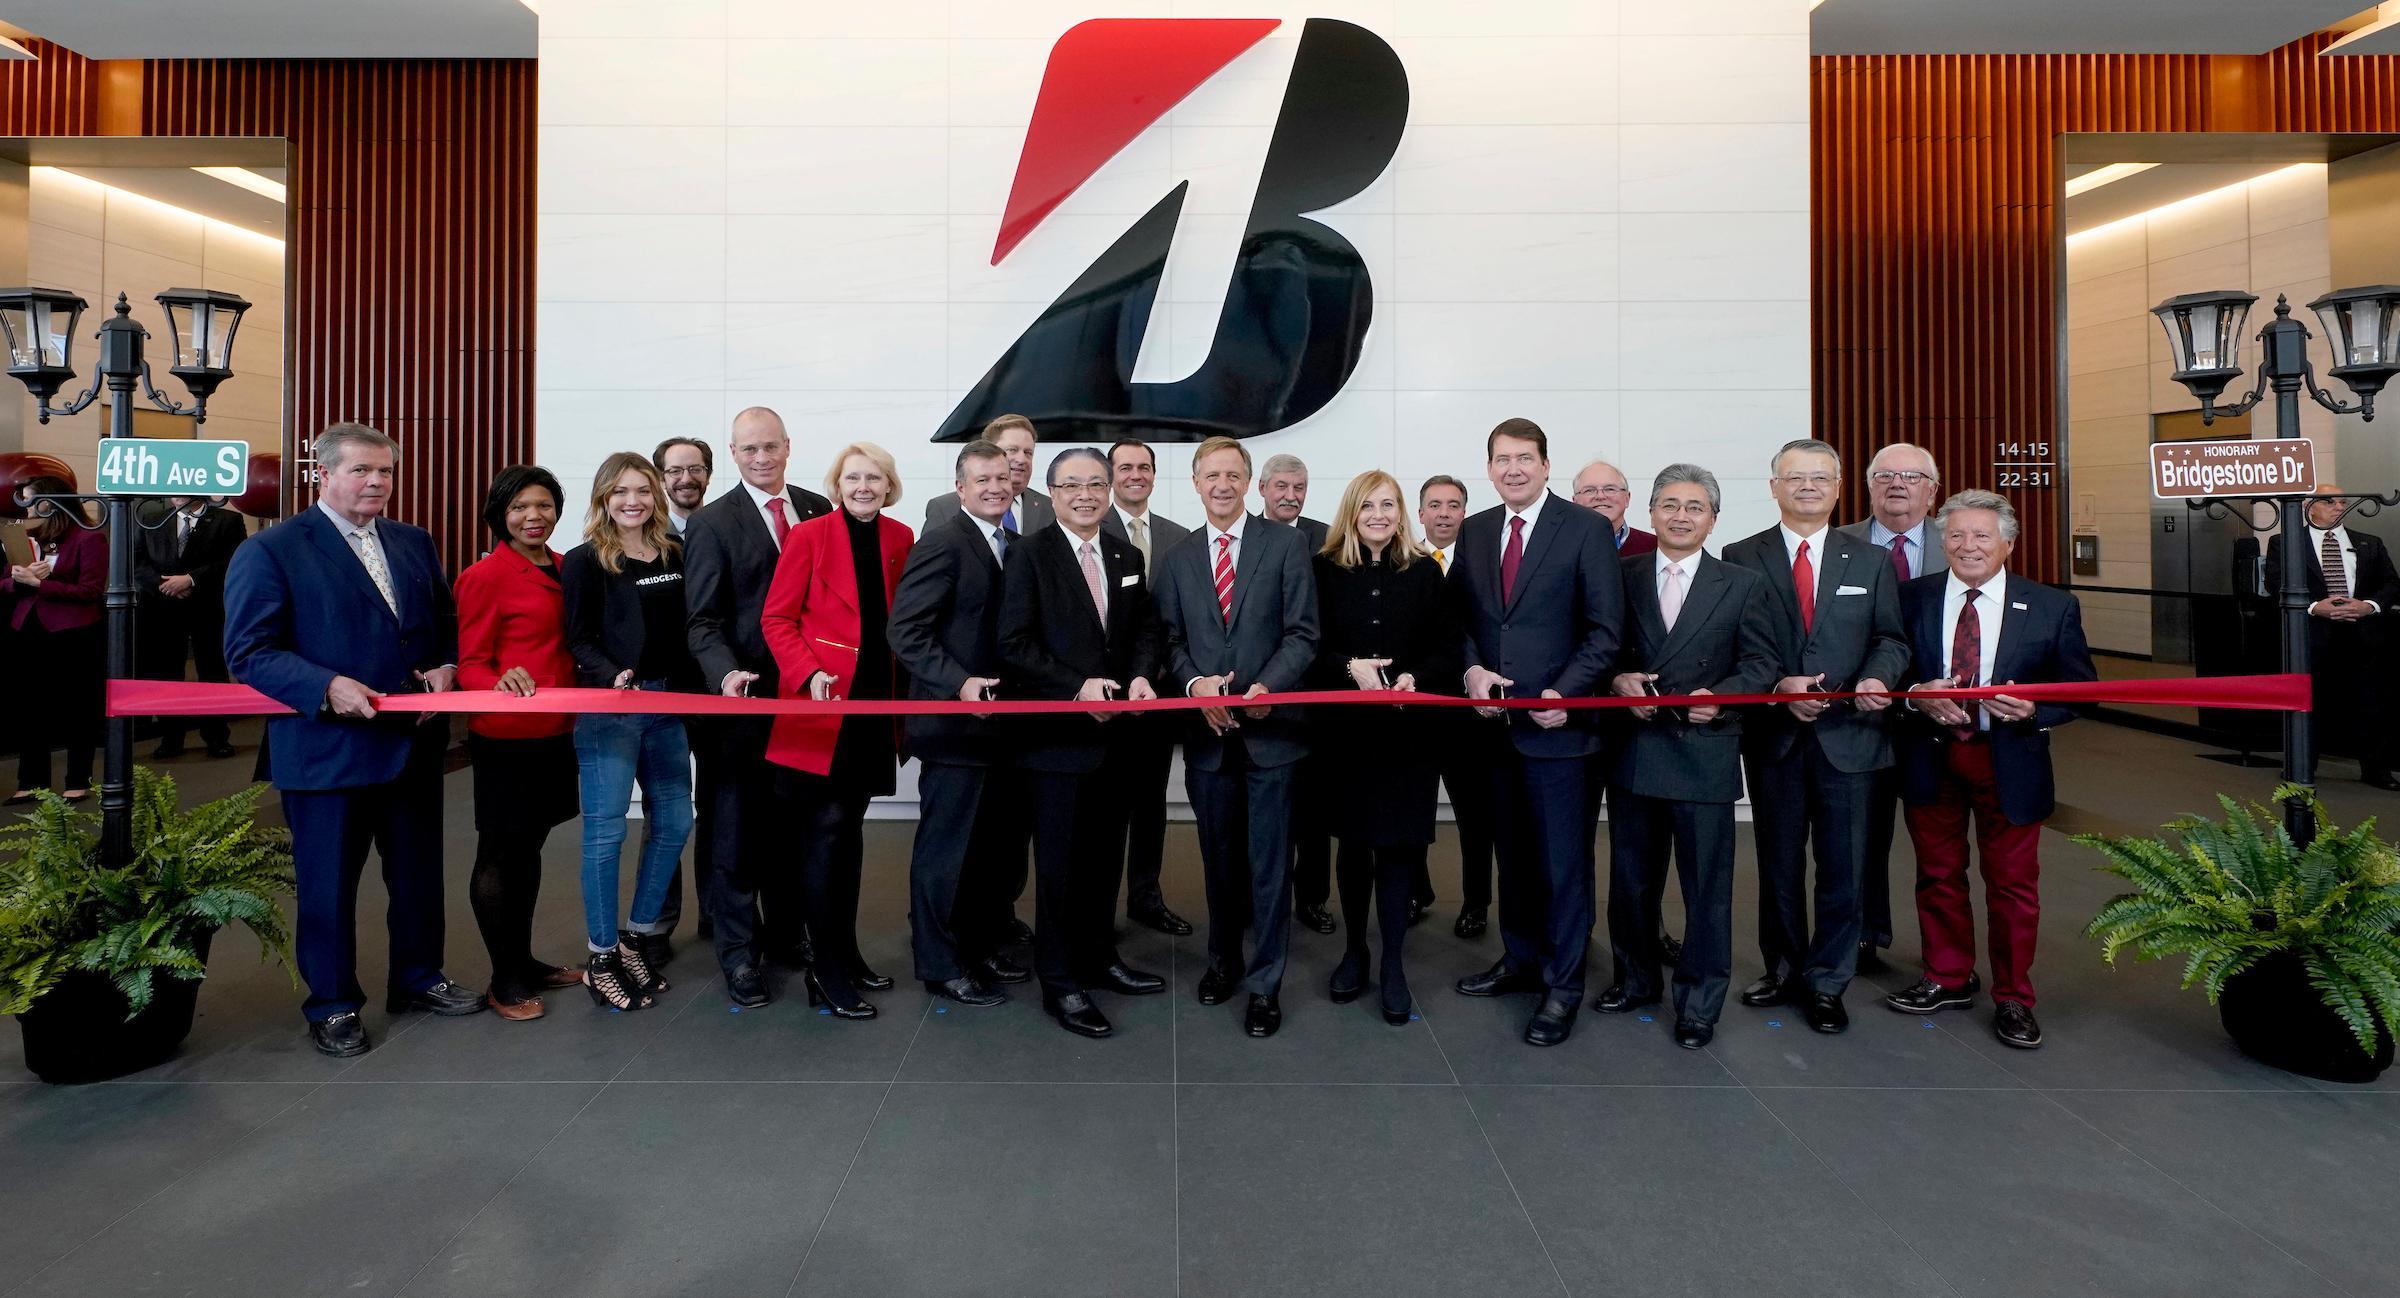 Bridgestone Americas открыла новую штаб-квартиру в центре Нэшвилла